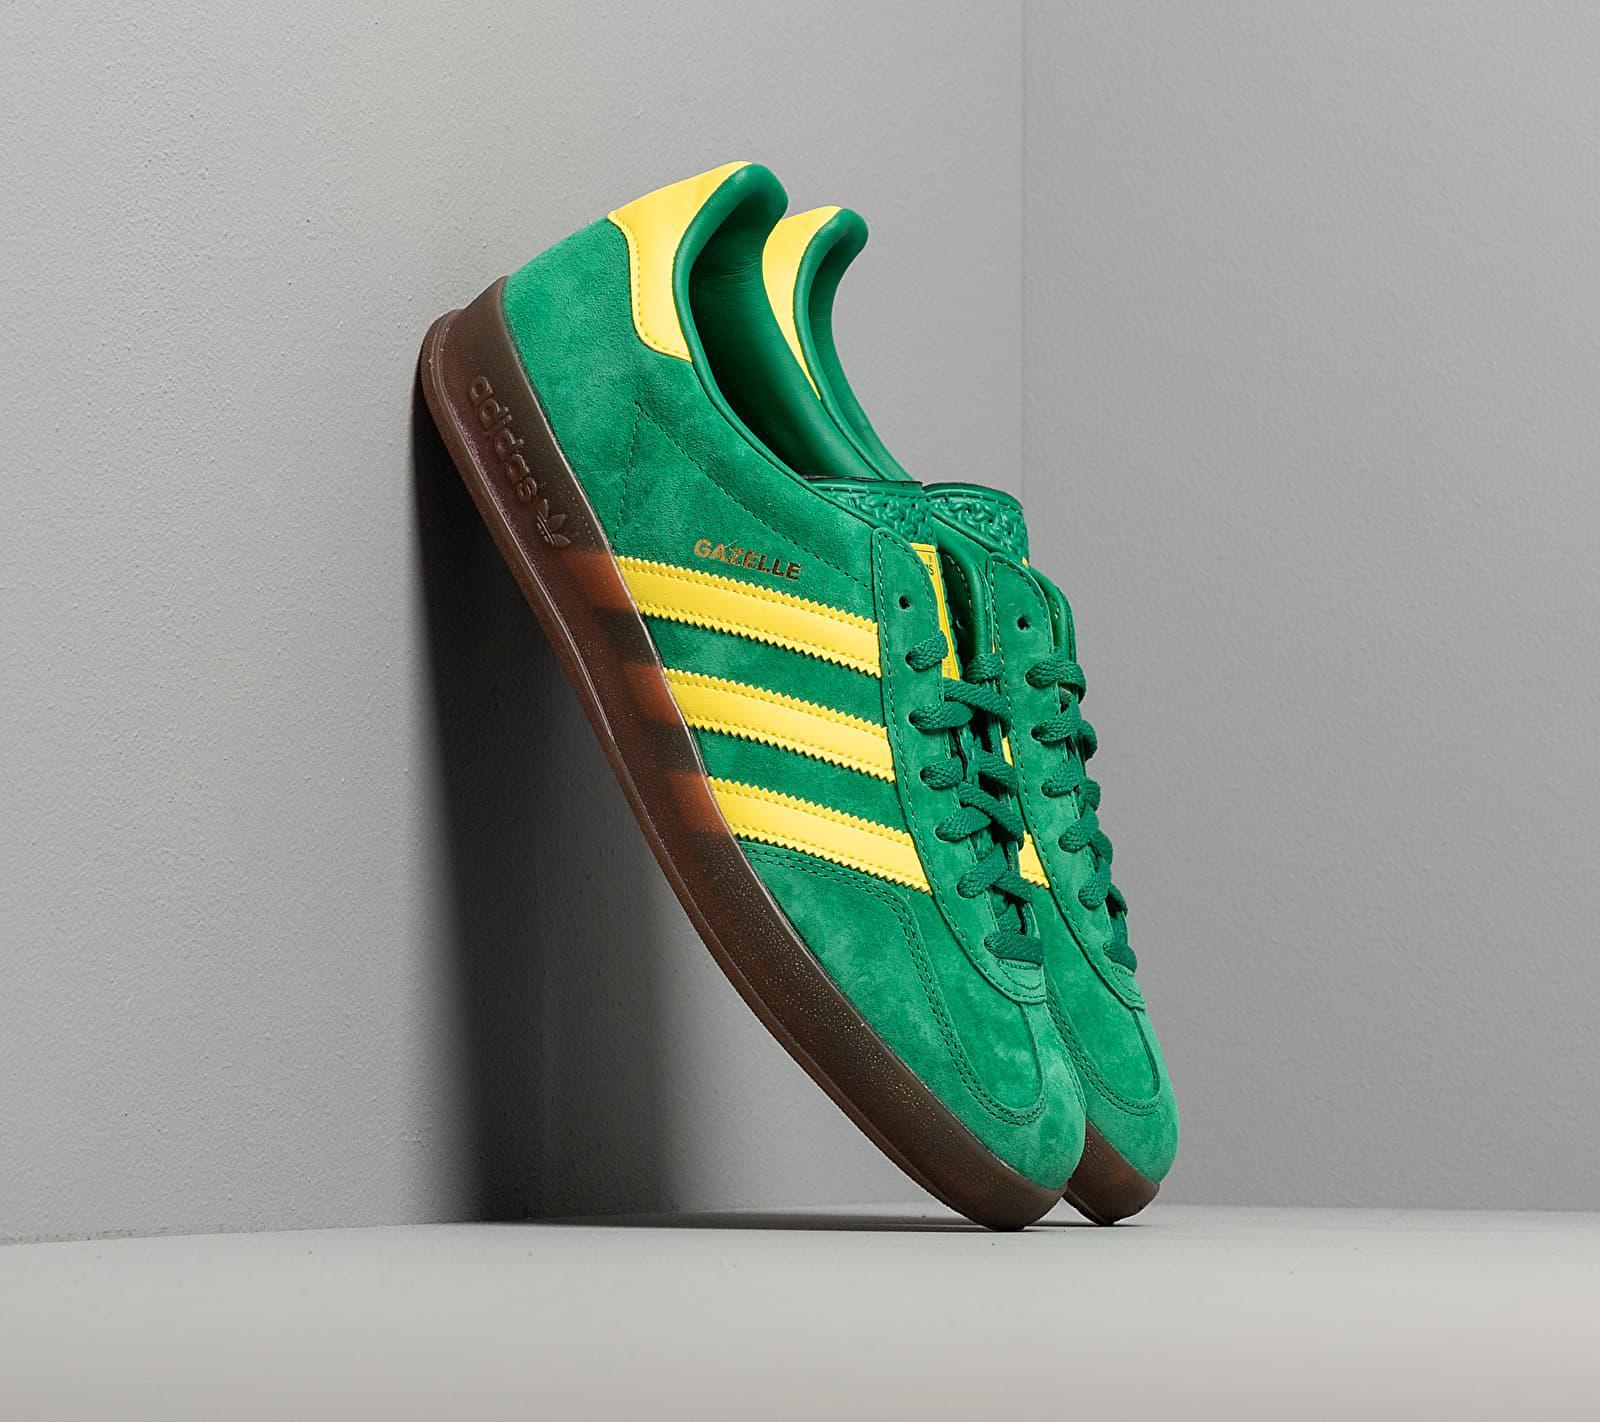 Adidas Gazelle Indoor Bright Green/ Beta Yellow/ Gum5